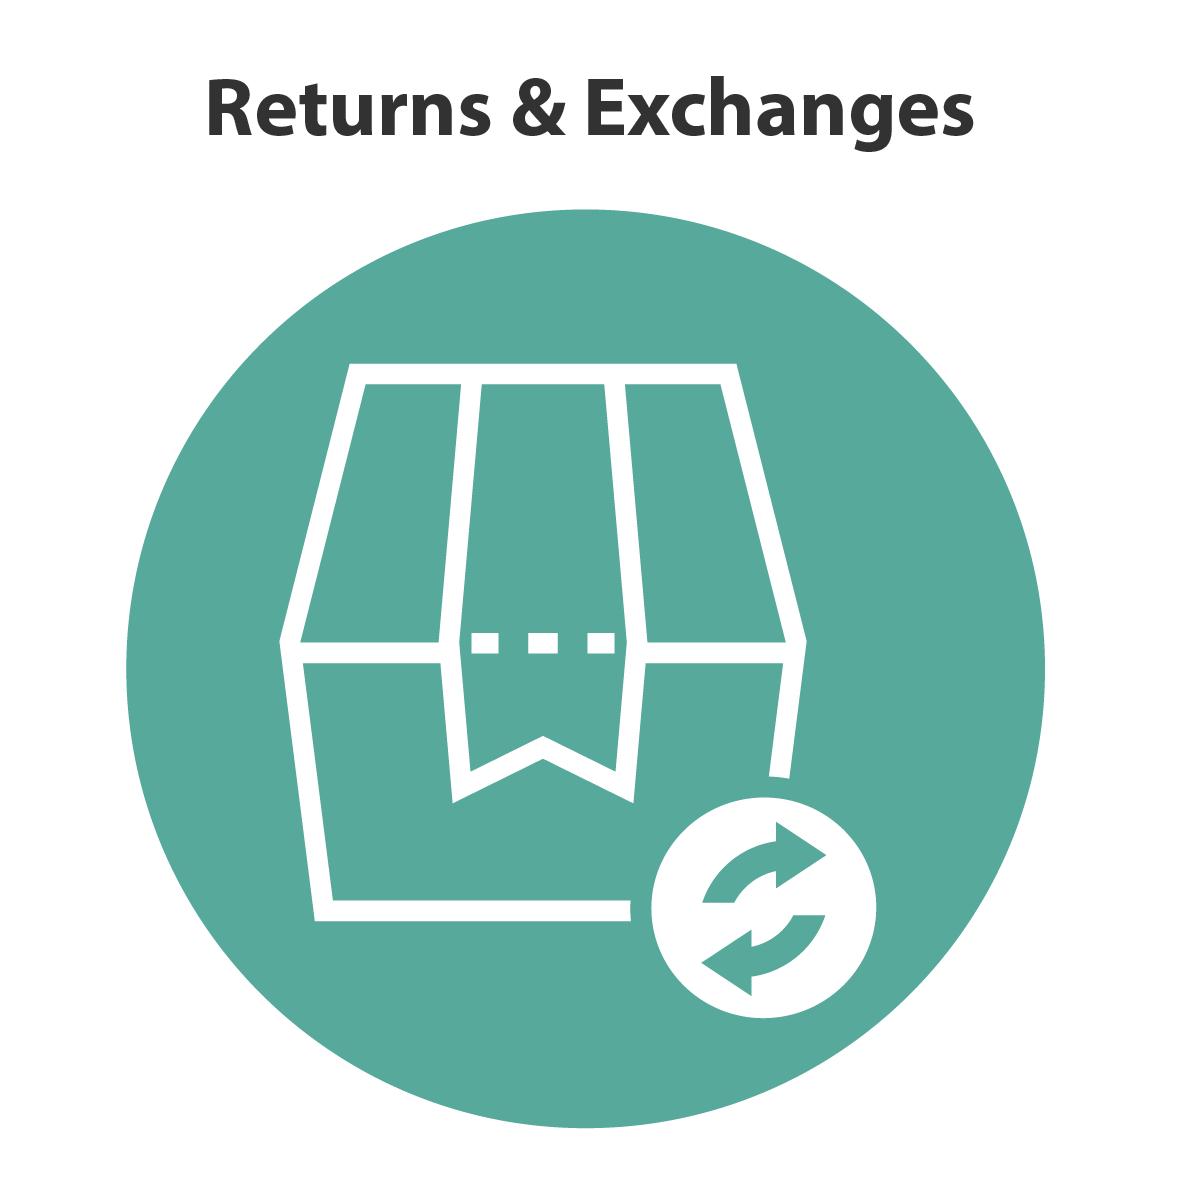 Return & Exchange